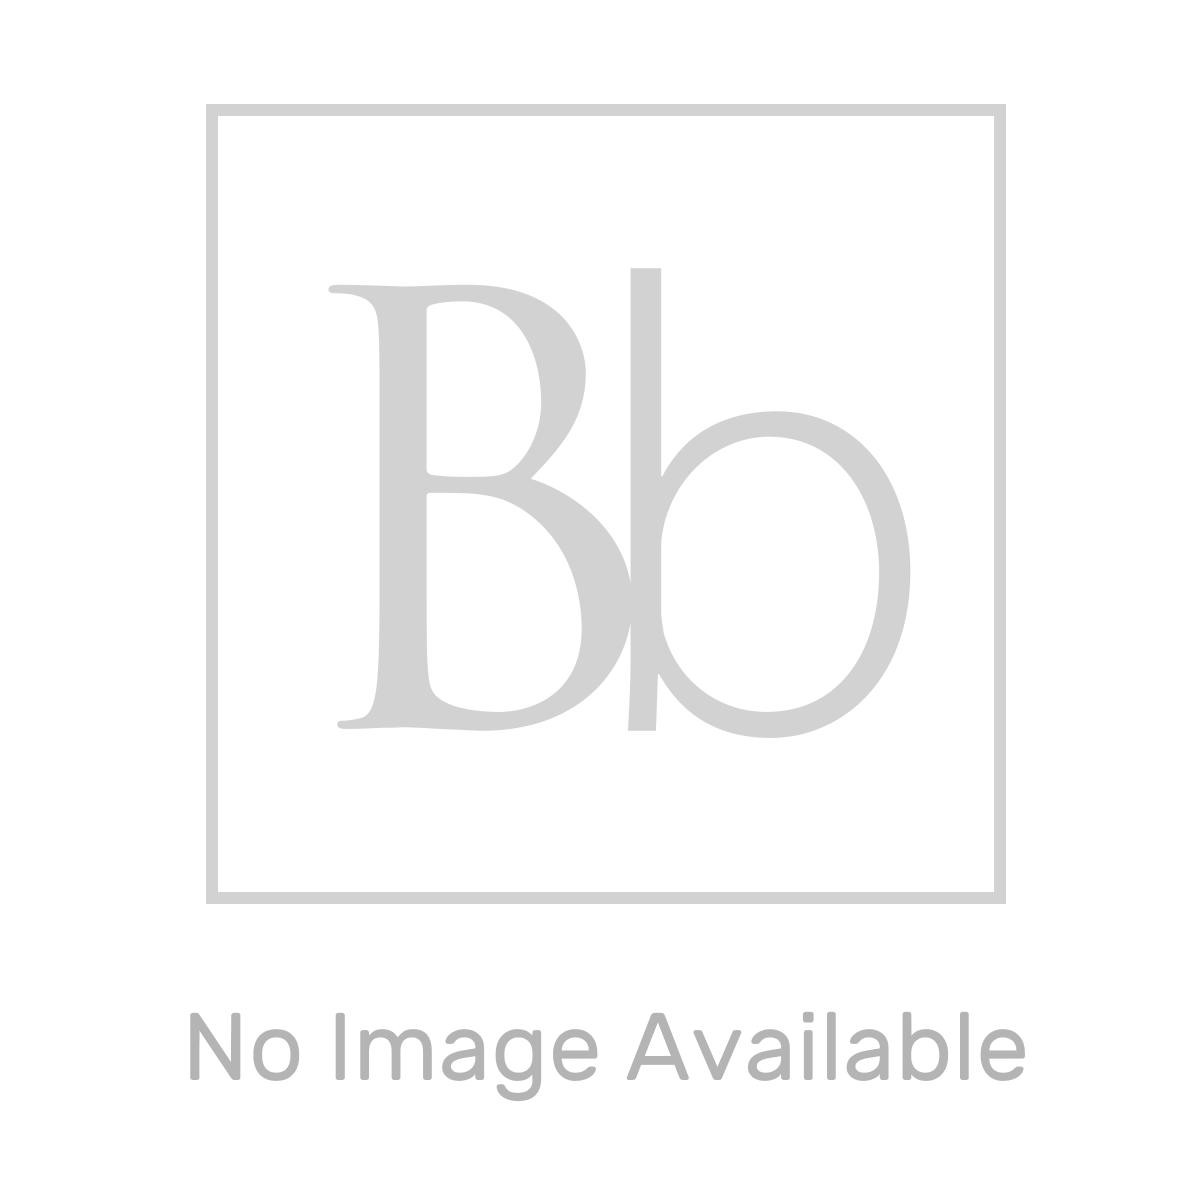 RAK Washington Low Level WC with Soft Close Seat (Wood) Line Drawing